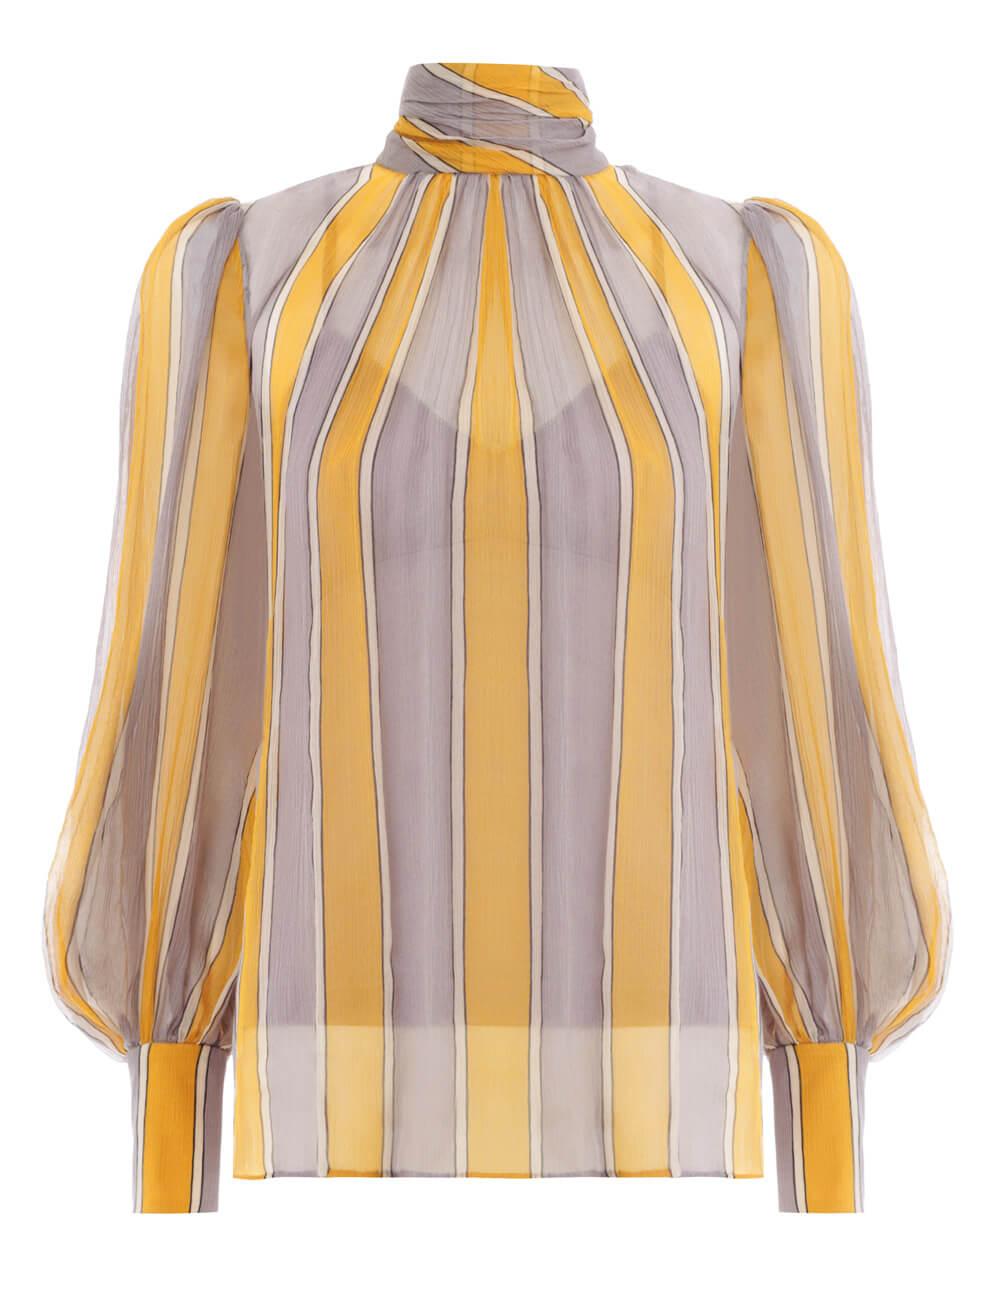 51be206d32f81 Shop Women's Designer Tops Online | ZIMMERMANN